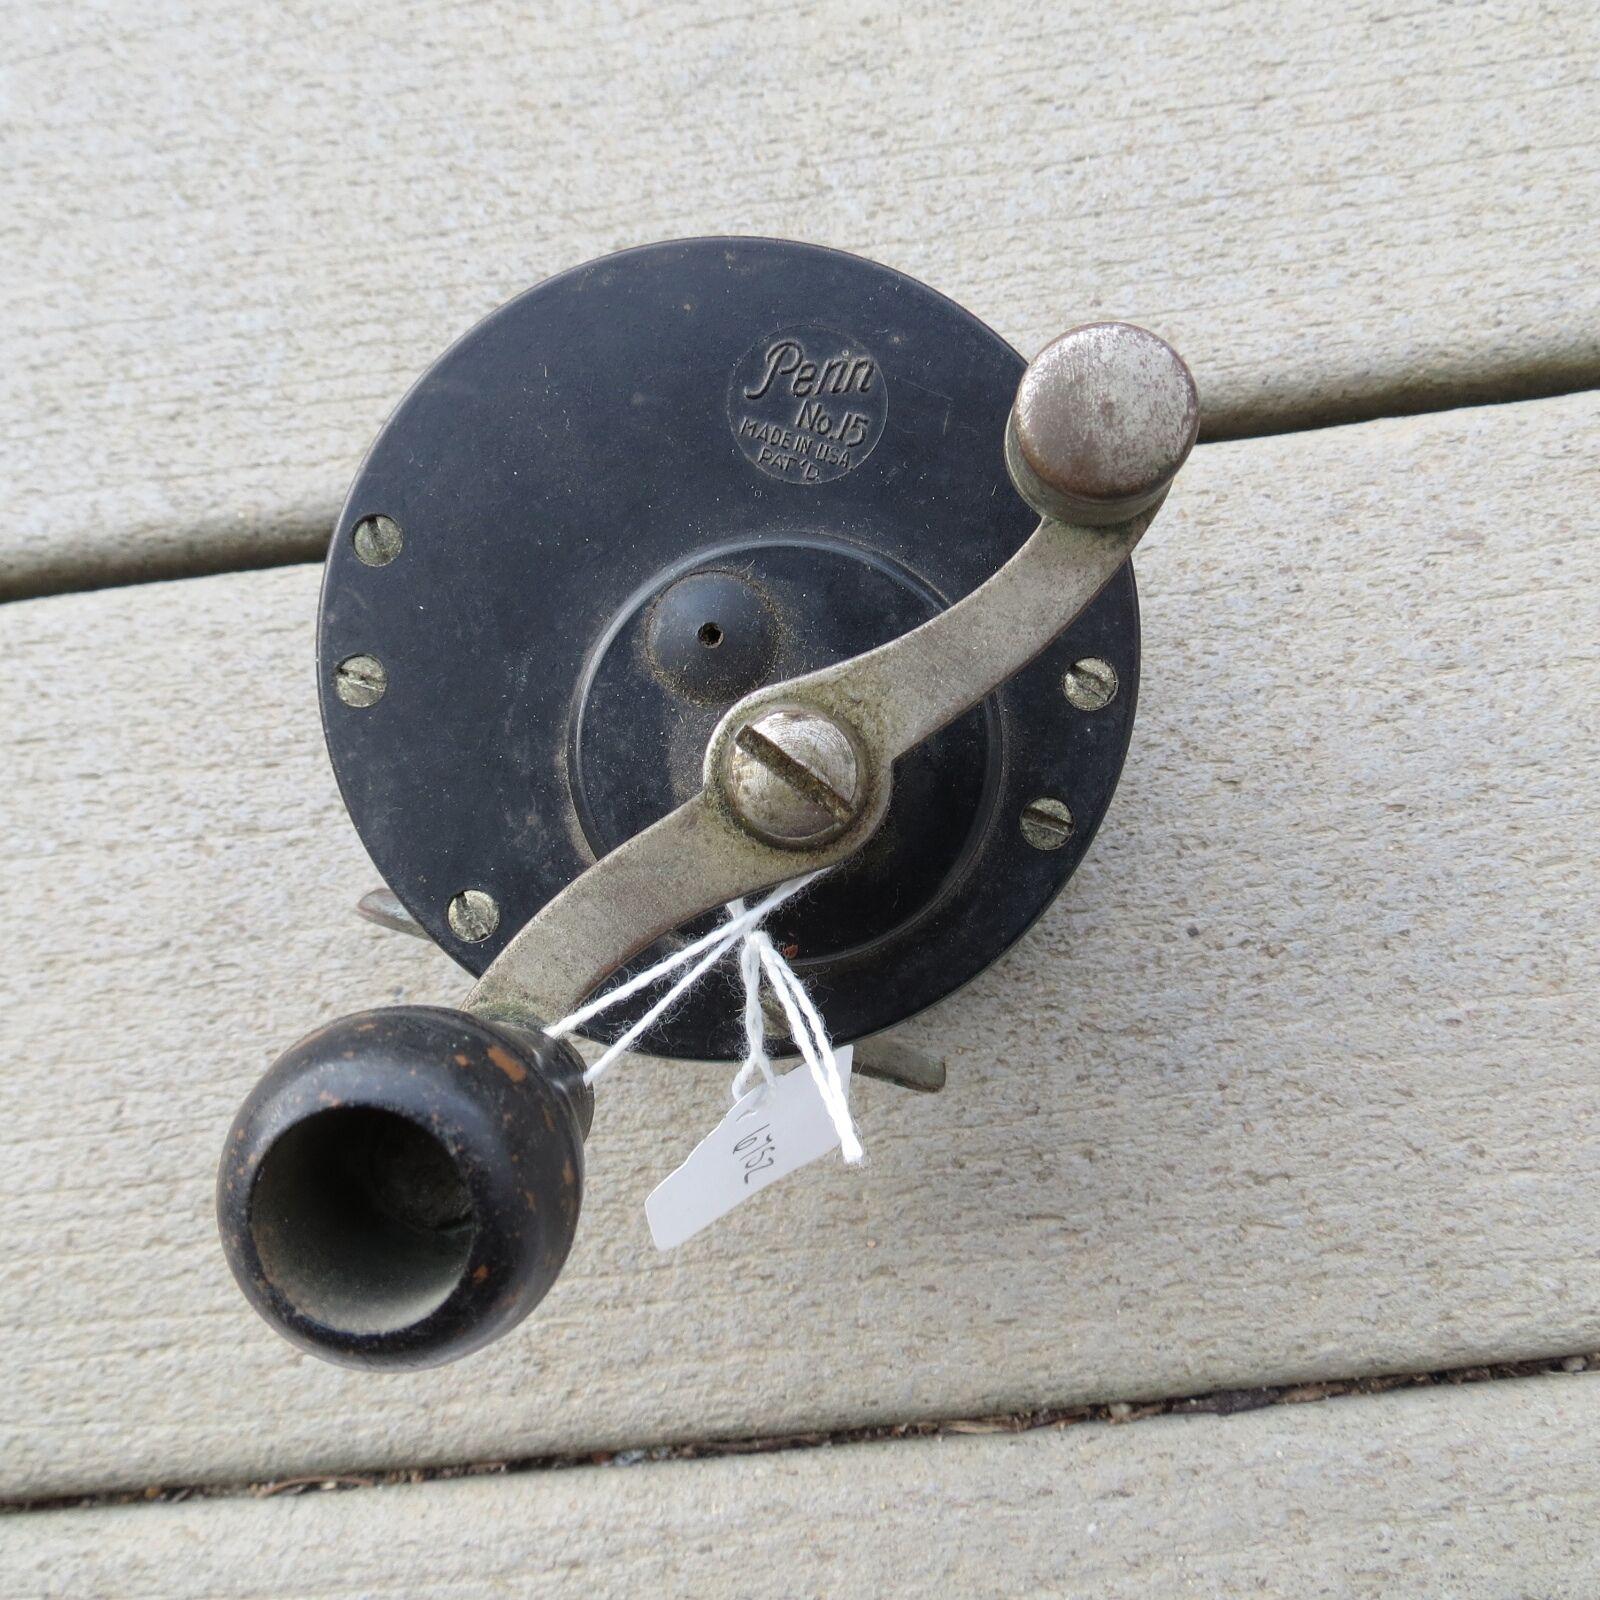 Vintage Penn No. 15 fishing reel   reel made in USA Pat. D original handle  (lot 6752) 074c12